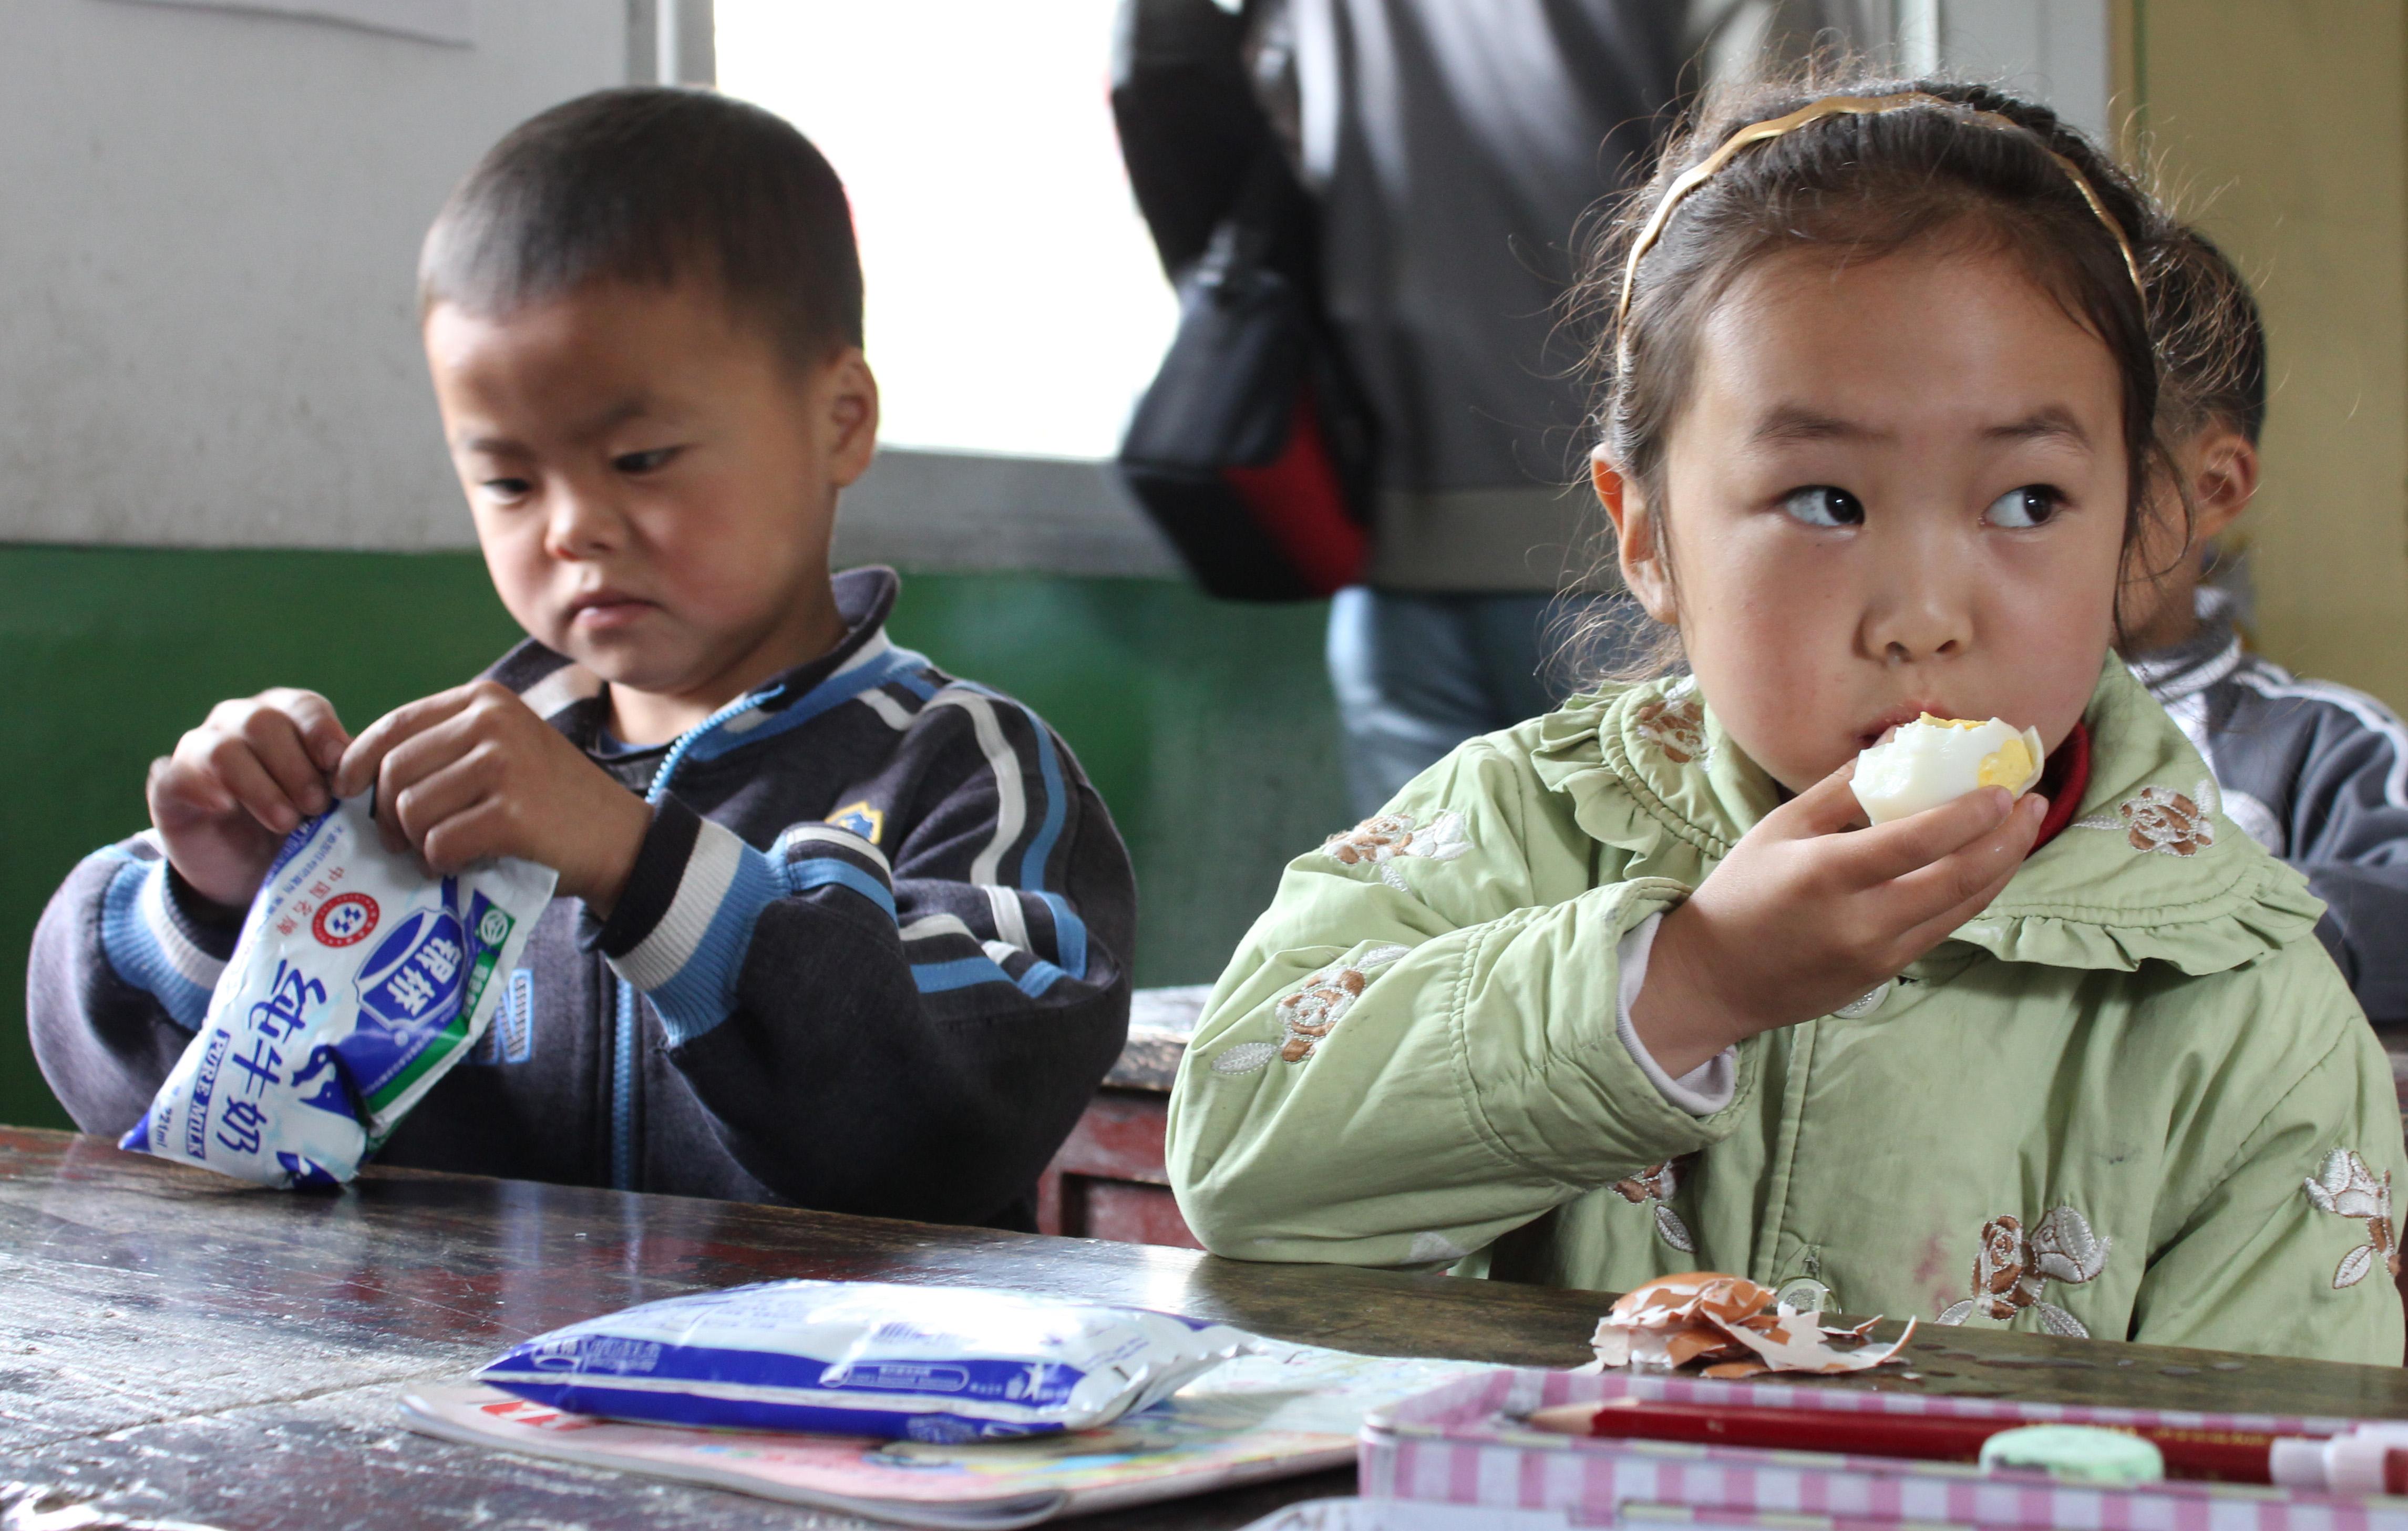 Young boy opening bag and girl eating egg